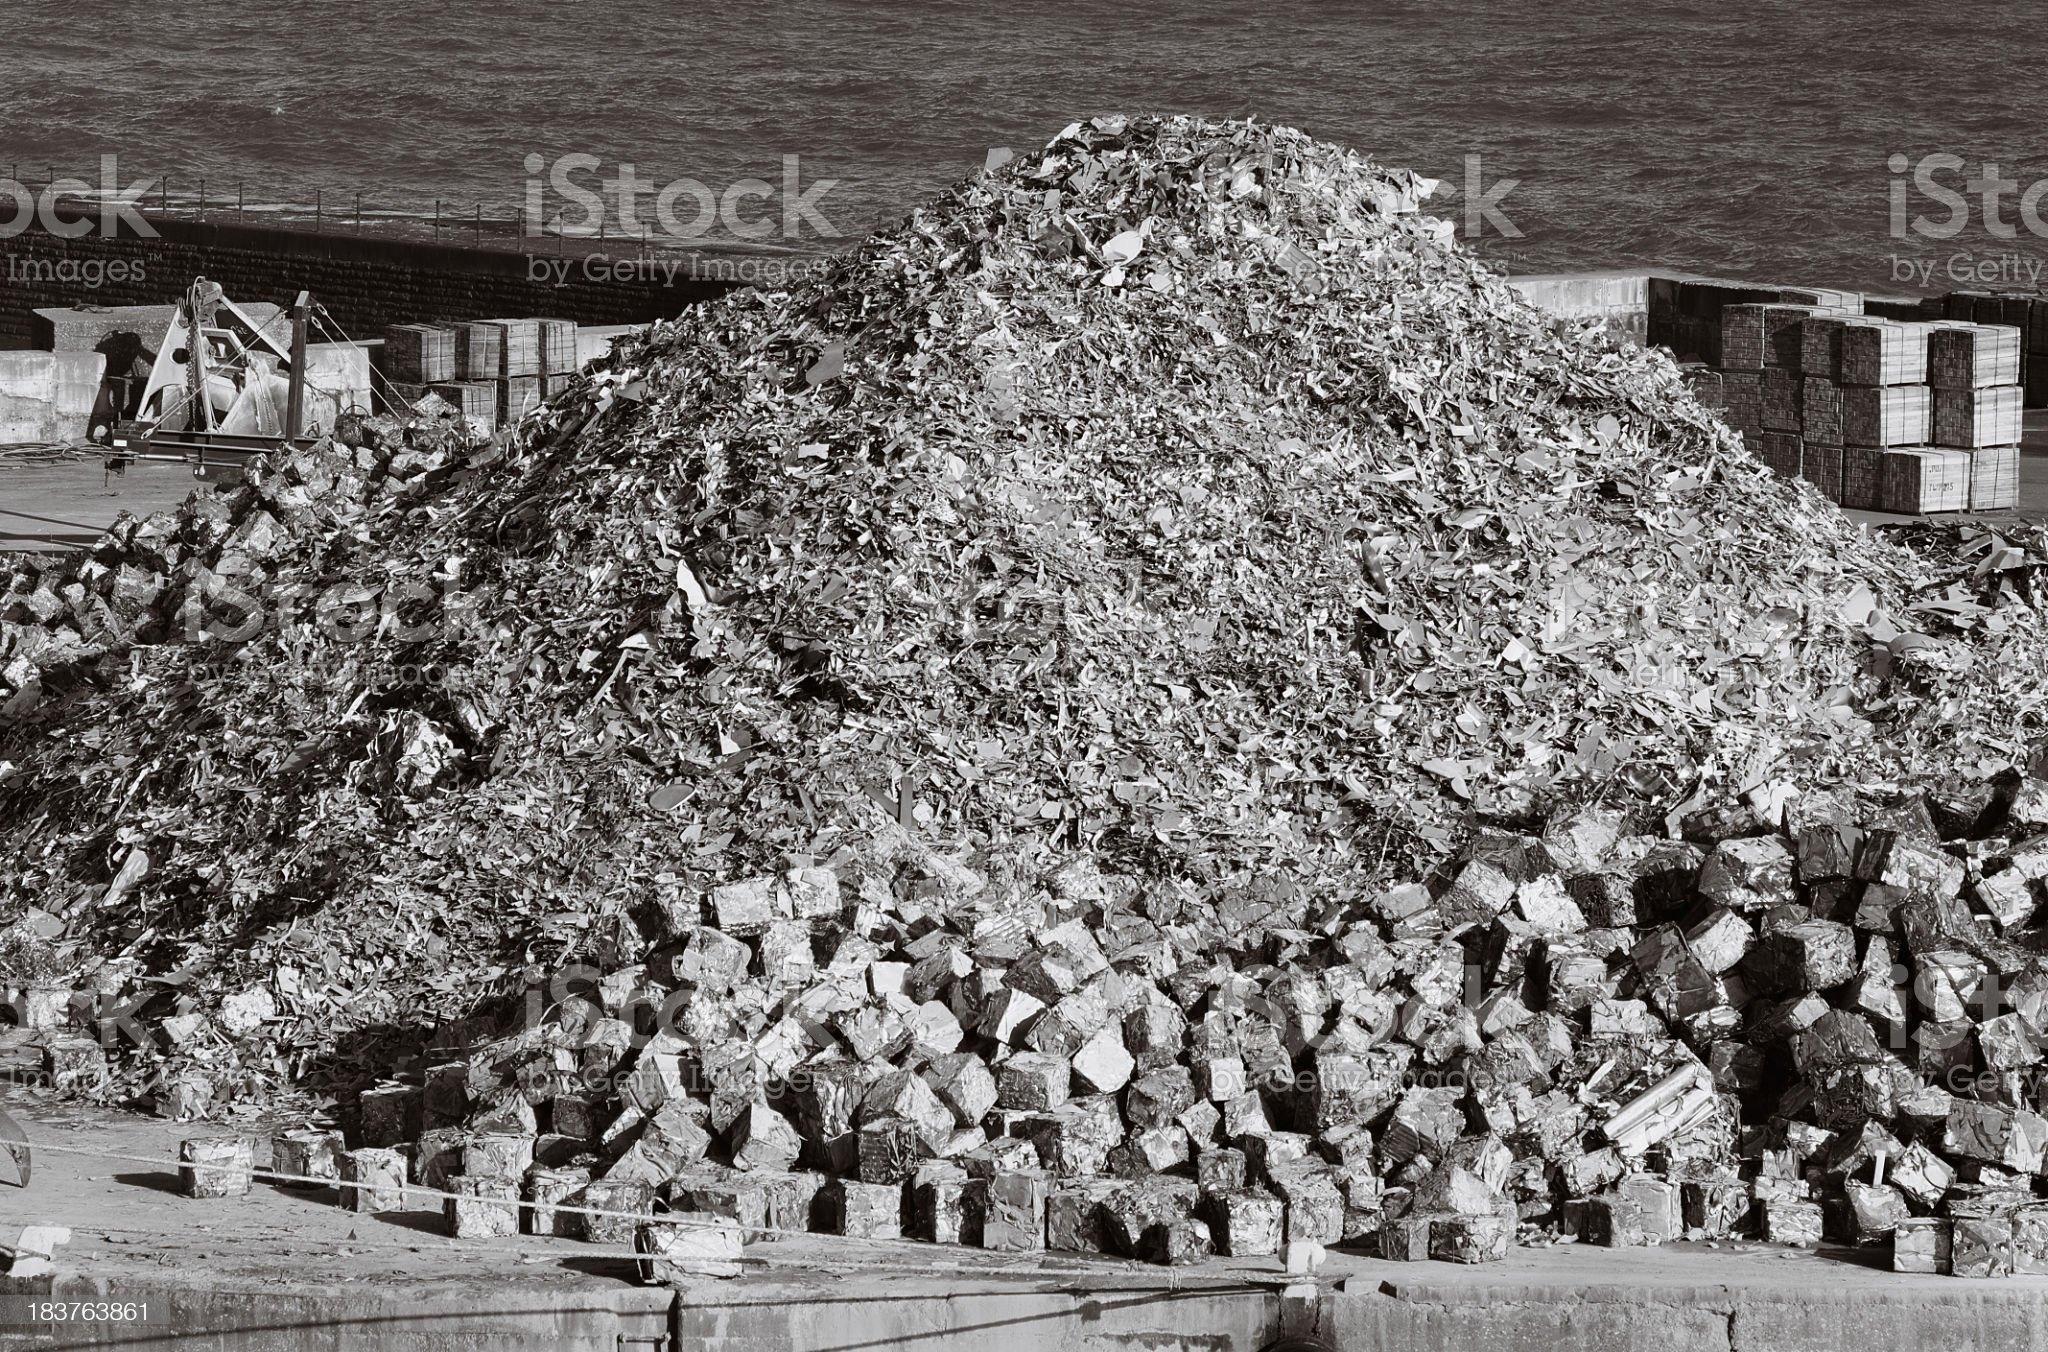 Scrap metal heap - Waste recycling royalty-free stock photo